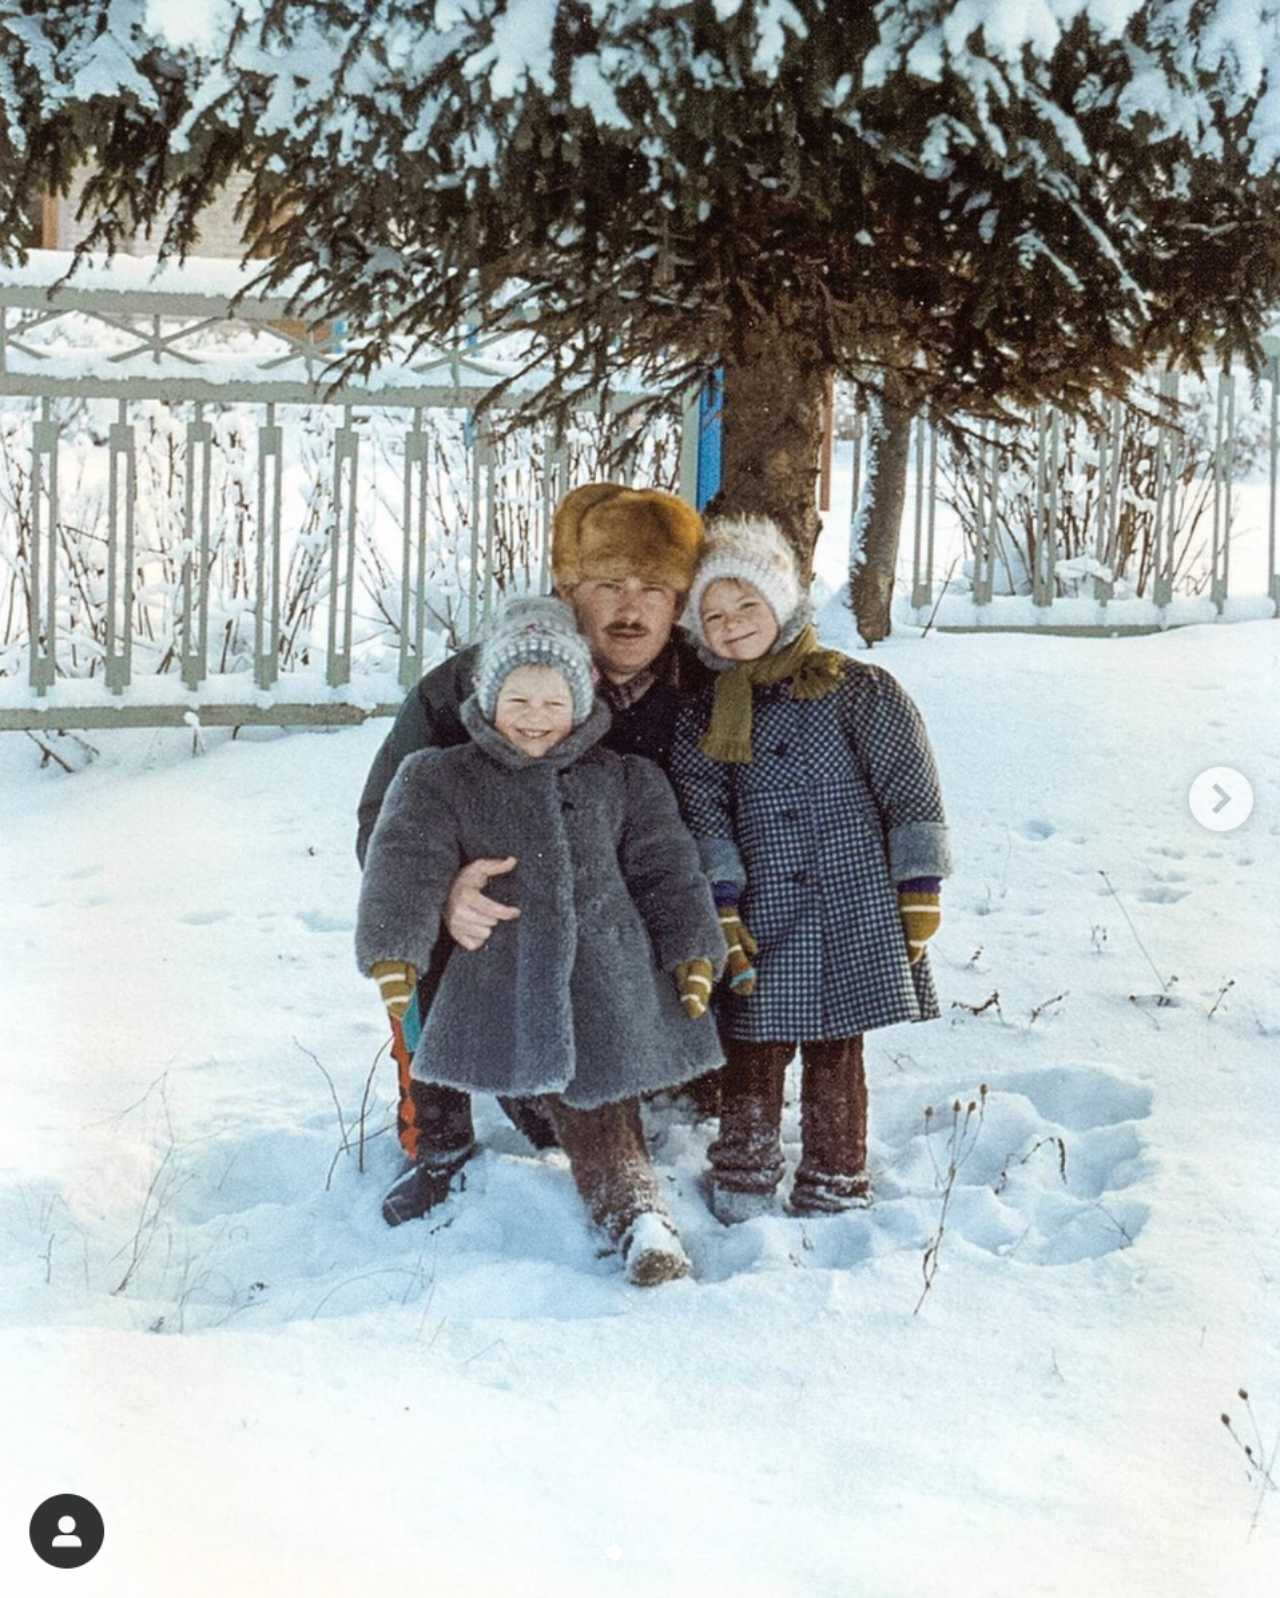 Irina Baeva con su papá y su hermana de niña